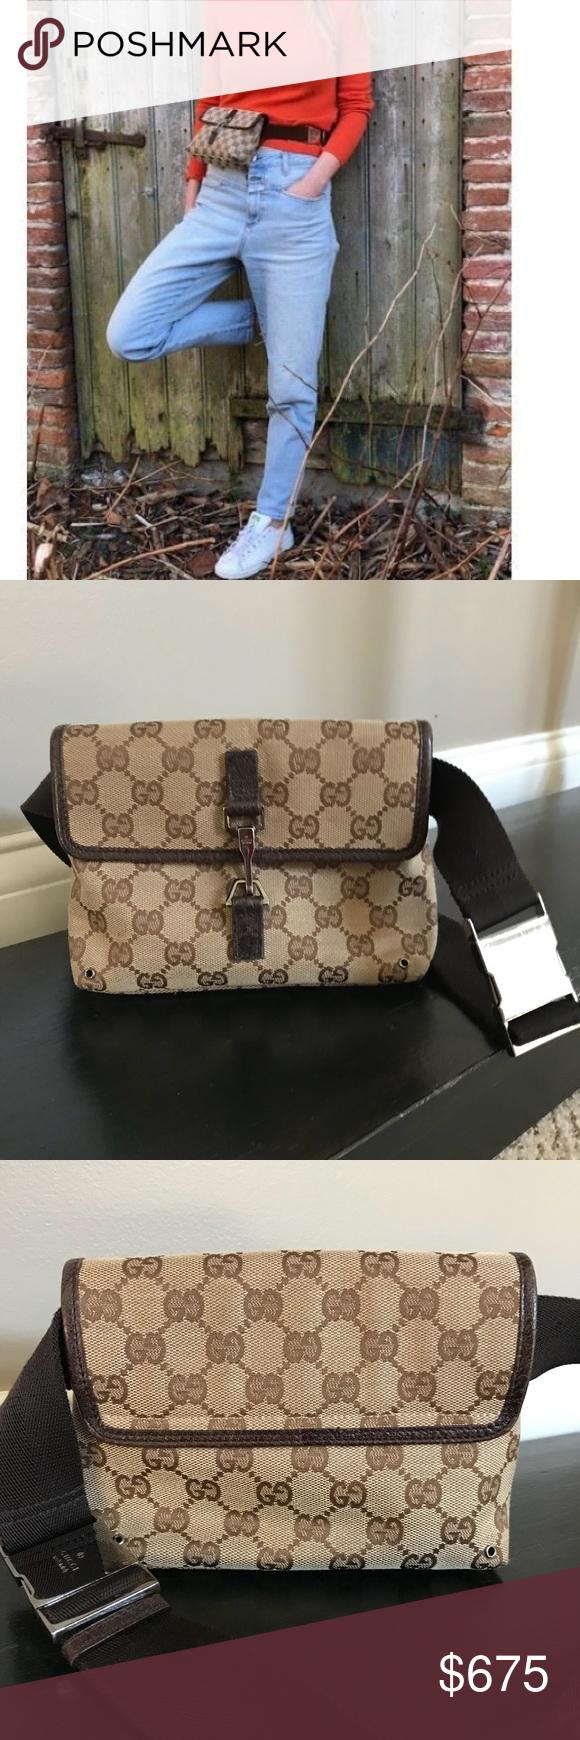 c2381c9f706 Rare Gucci Monogram GG Belt Bag Waist Fanny Pack Rare Gucci Monogram GG  Belt Bag Excellent